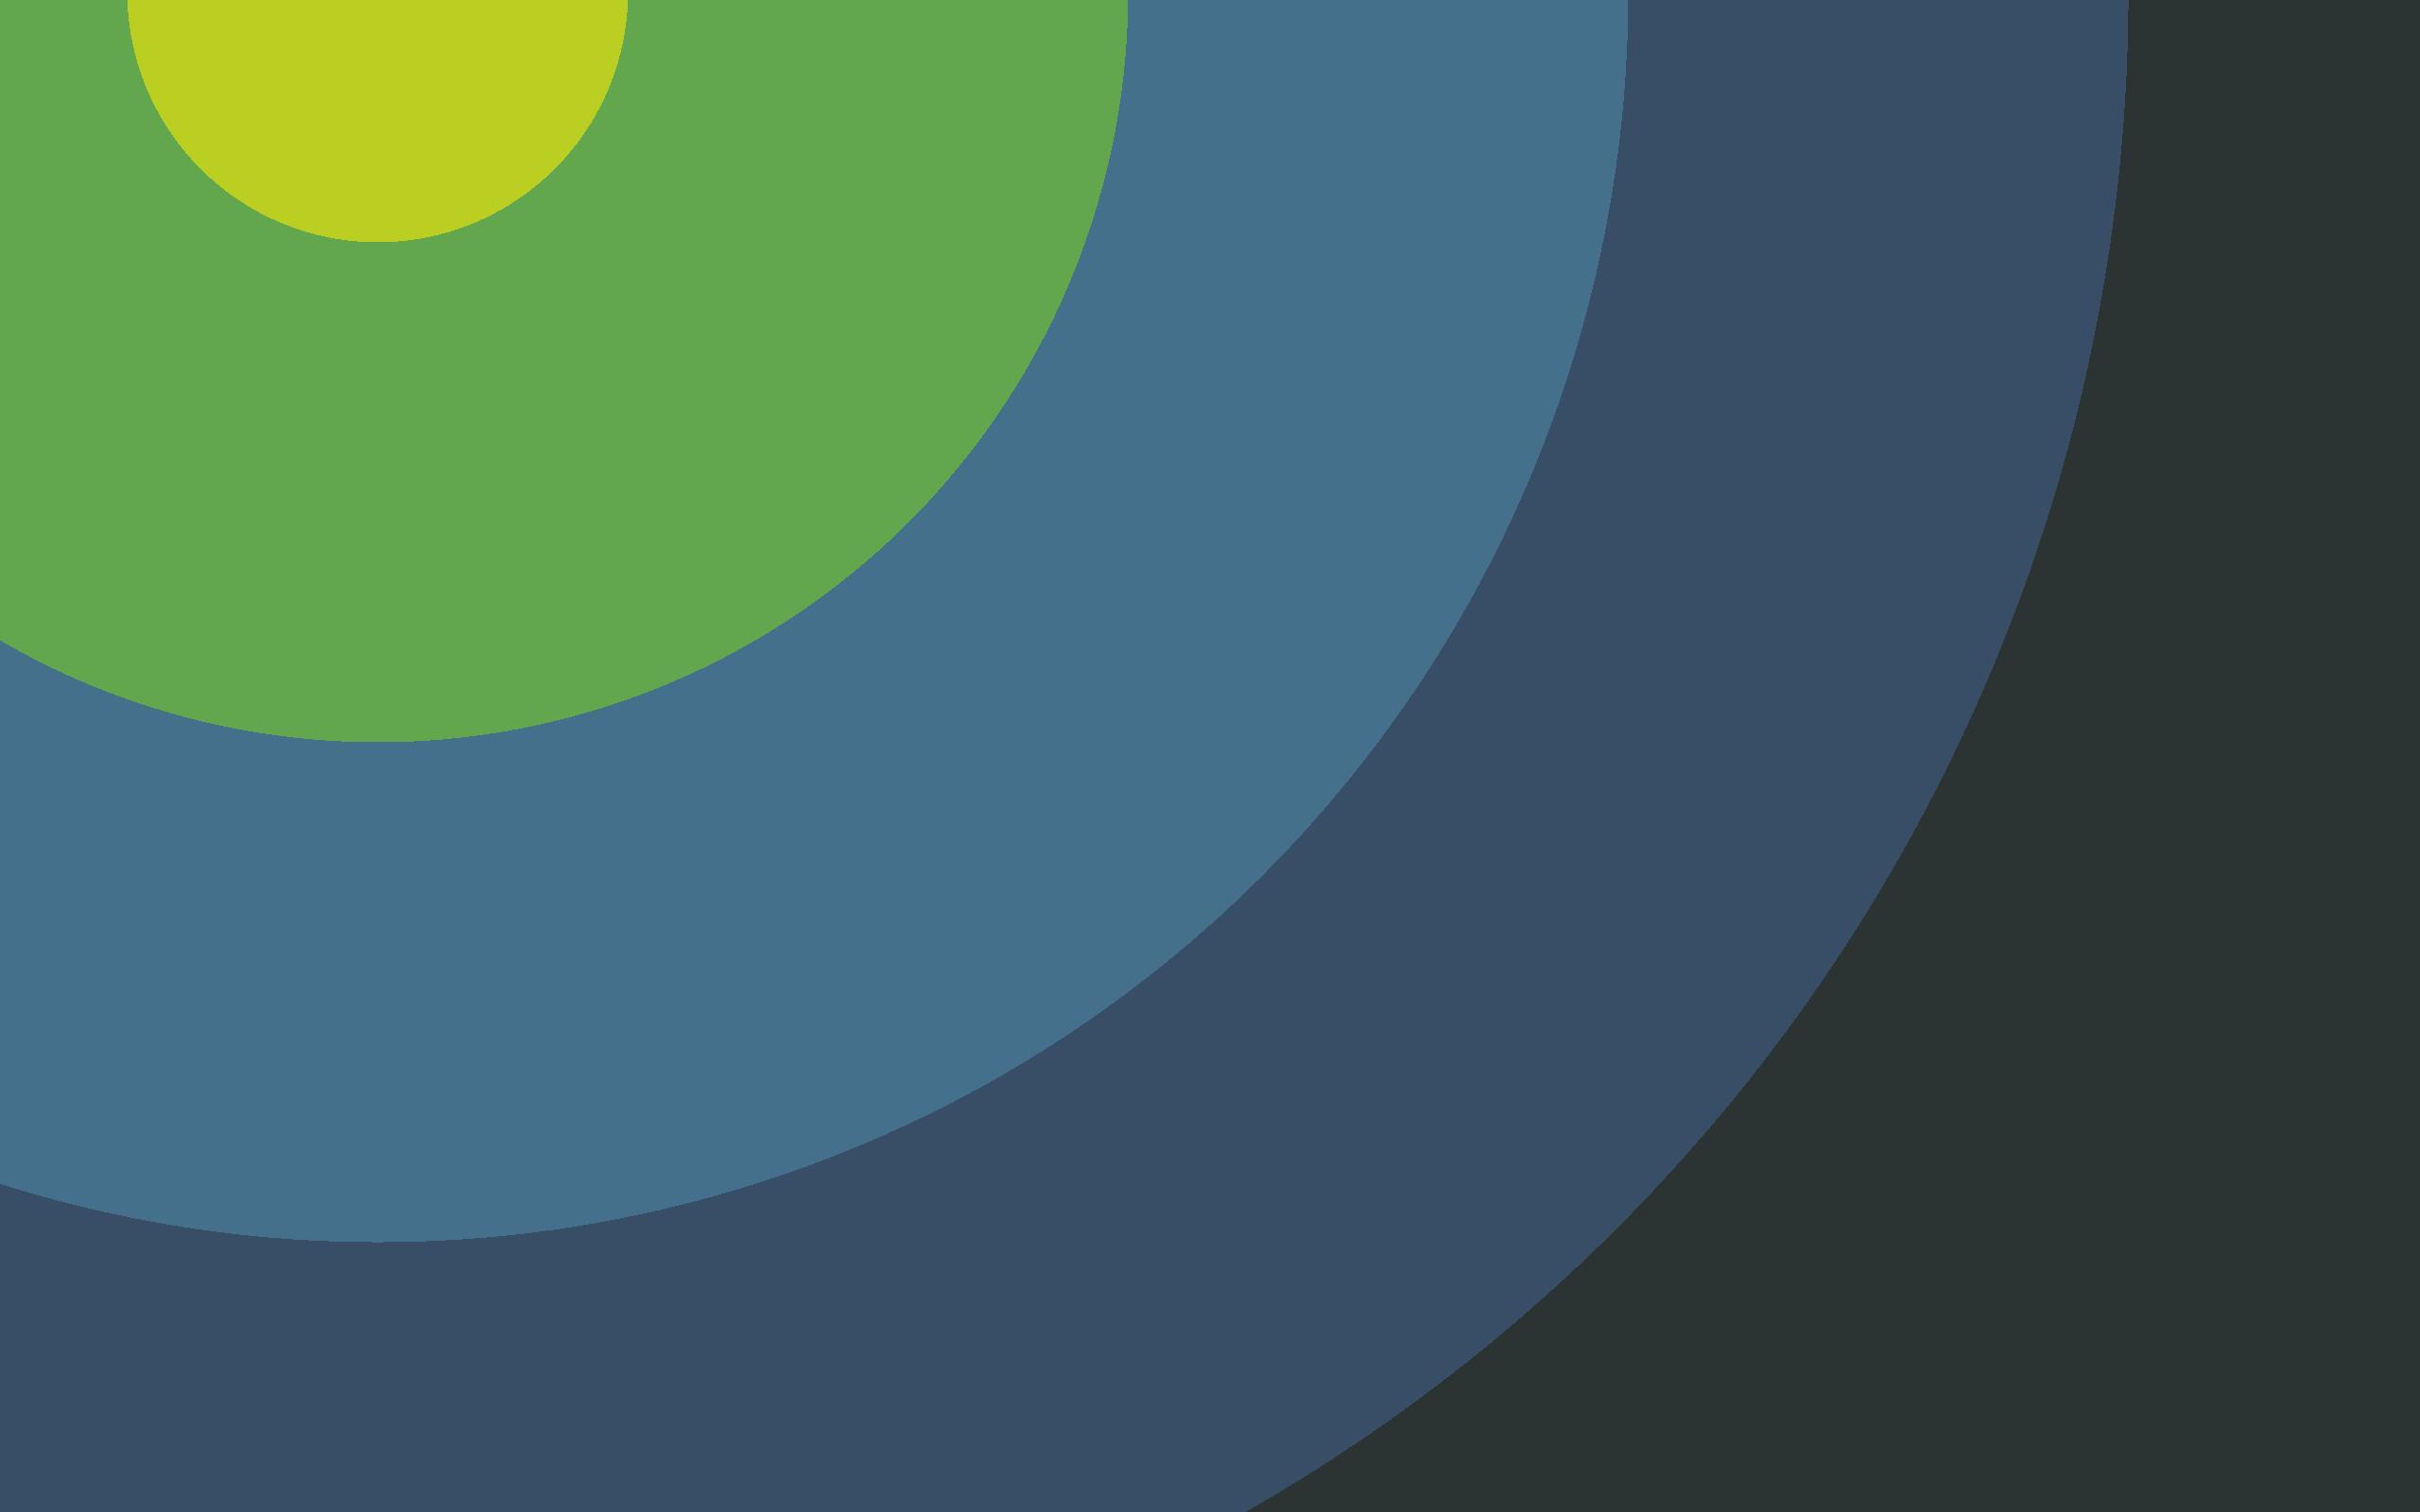 Flat Simple Wallpaper 17